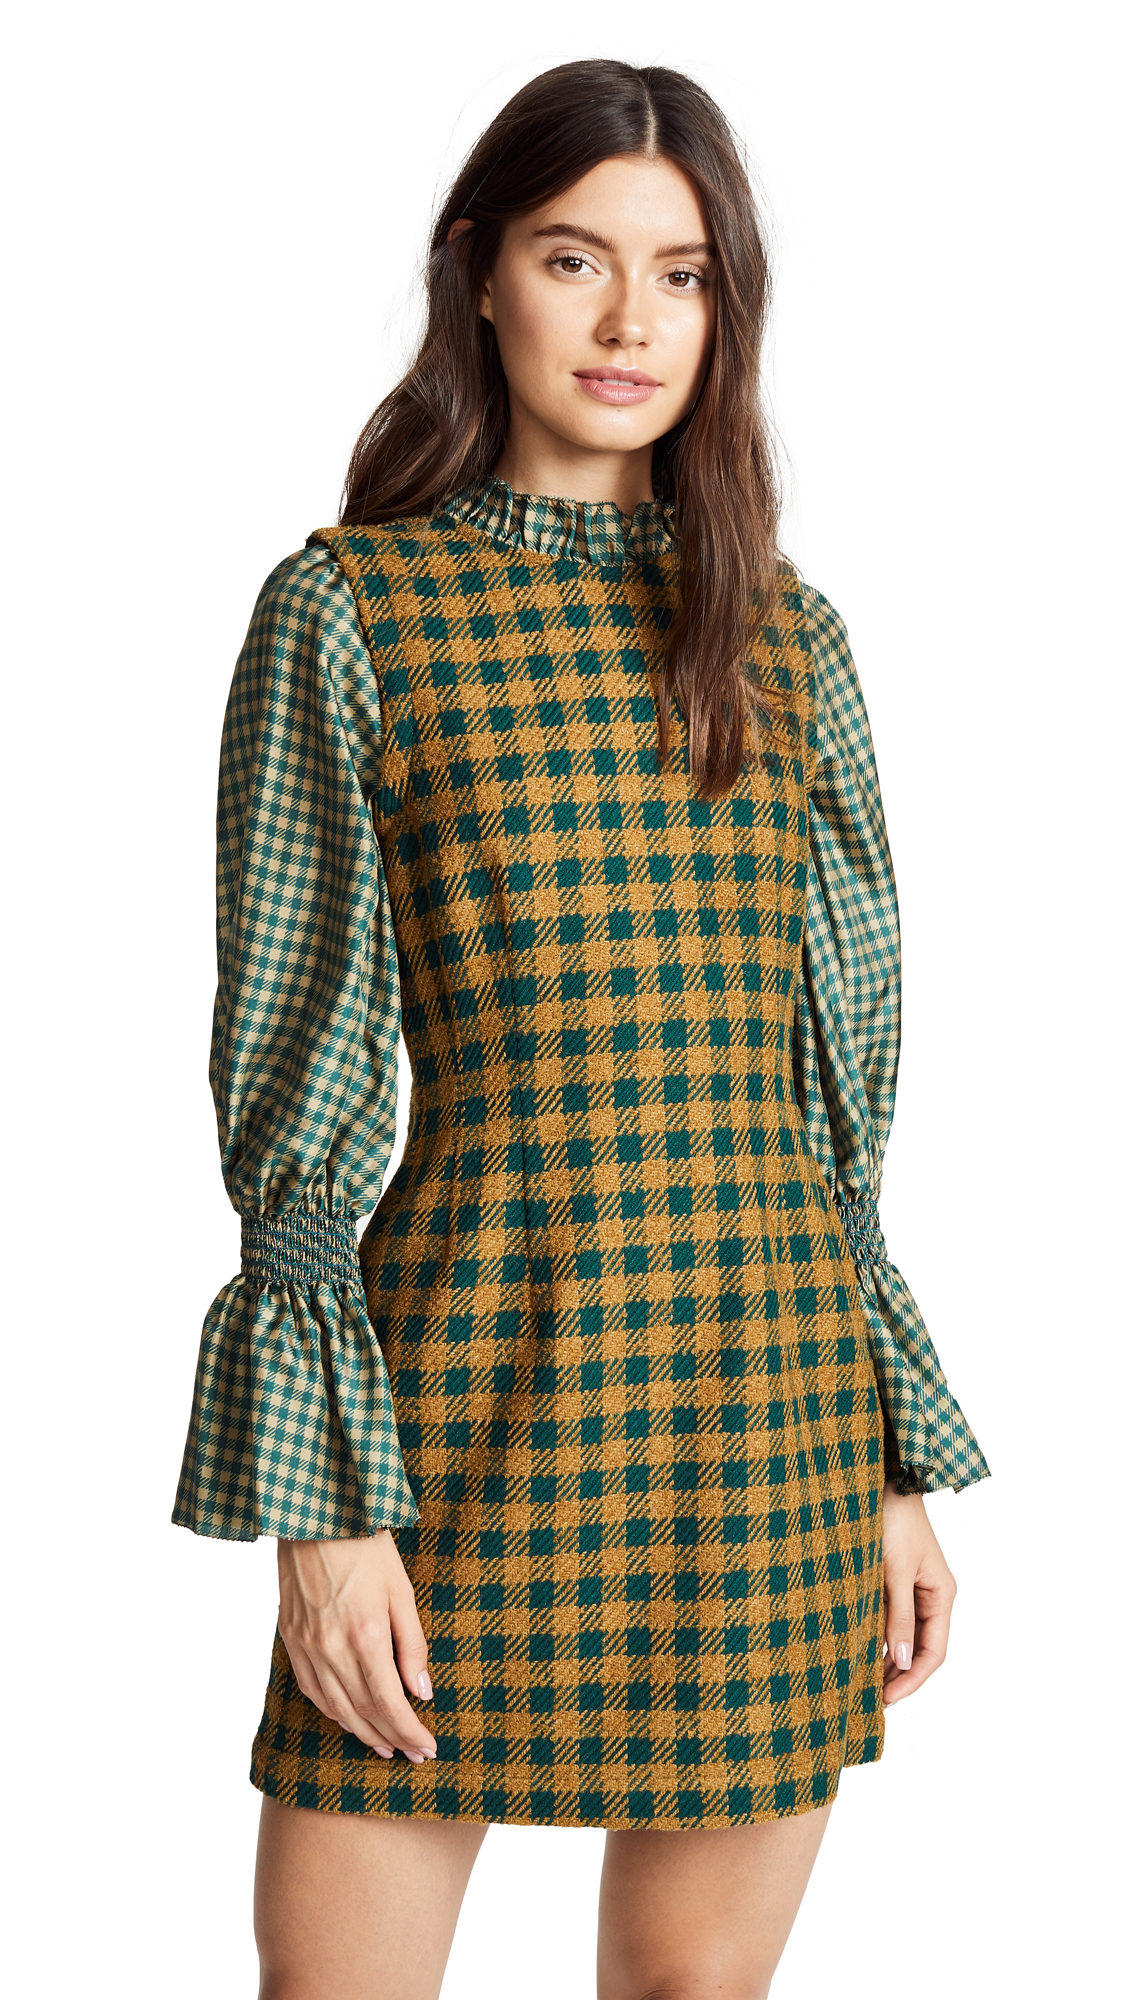 Sea Ethno Combo Dress - Green Check